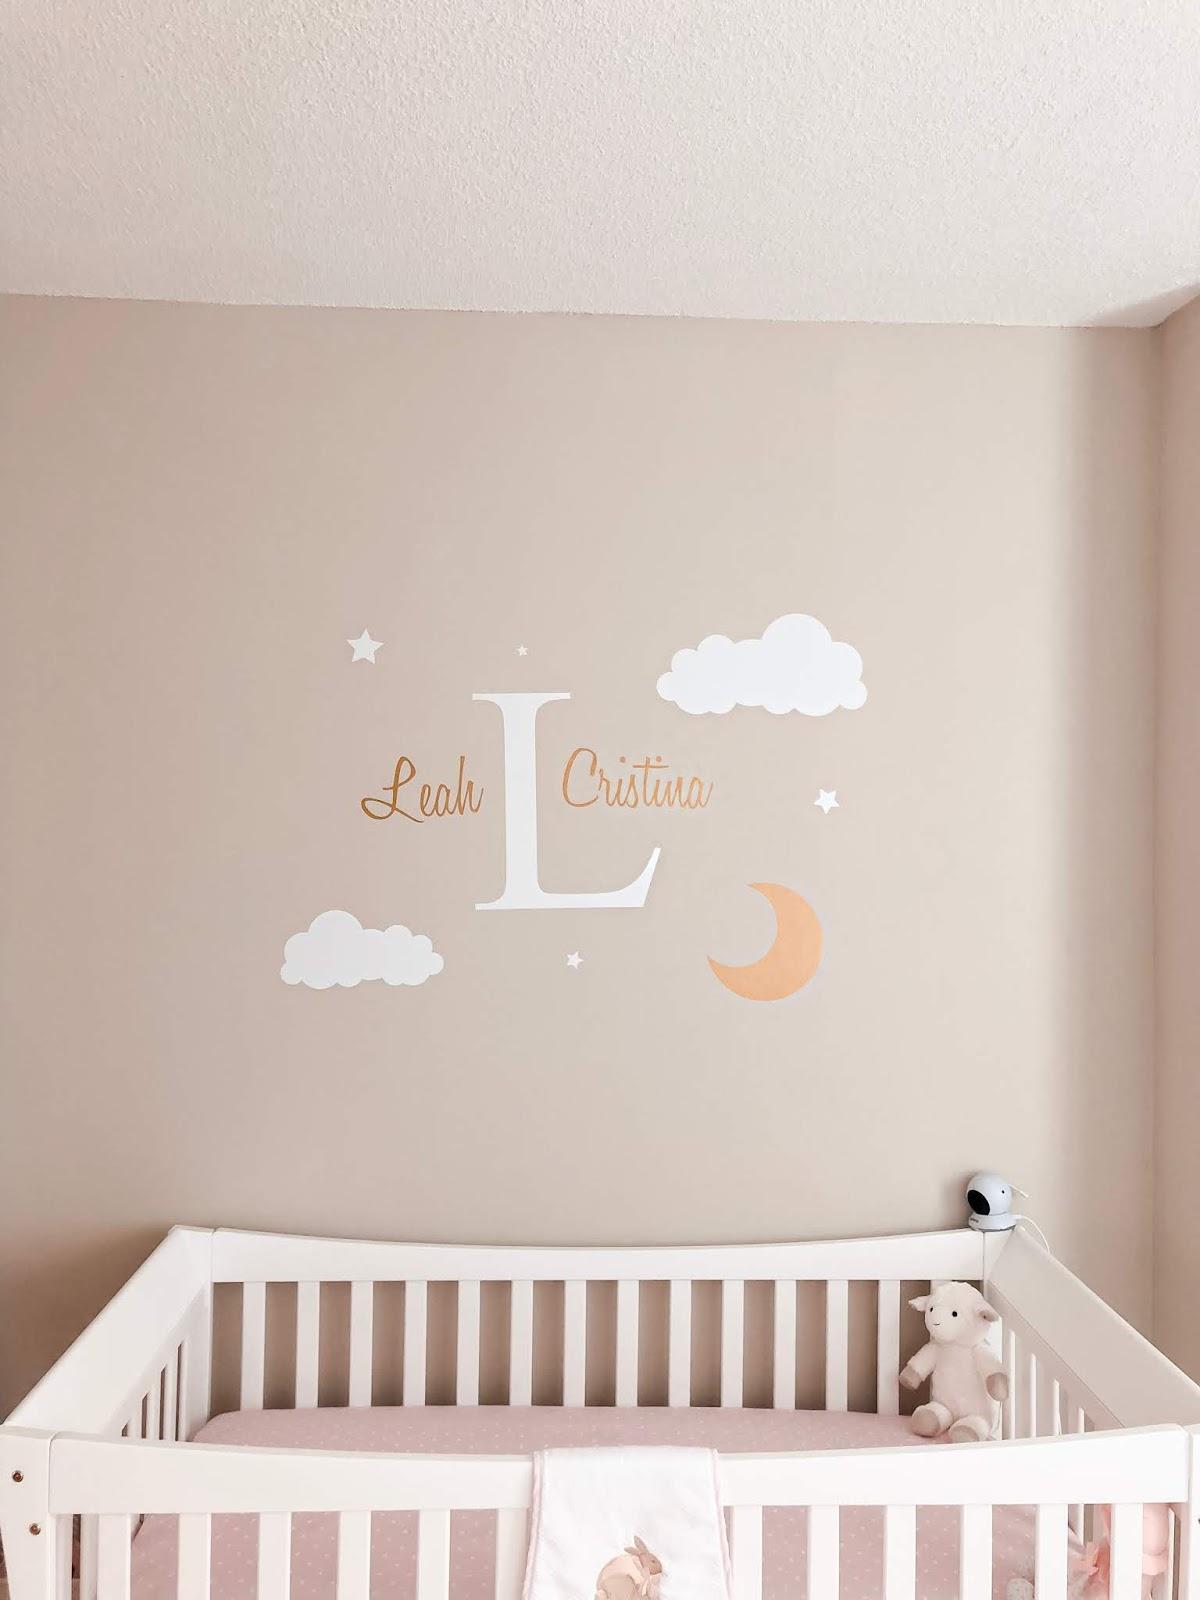 nursery ideas, nursery, girl nursery, mom bloggers, baby room ideas, nursery decor, nursery inspo, nursery styles